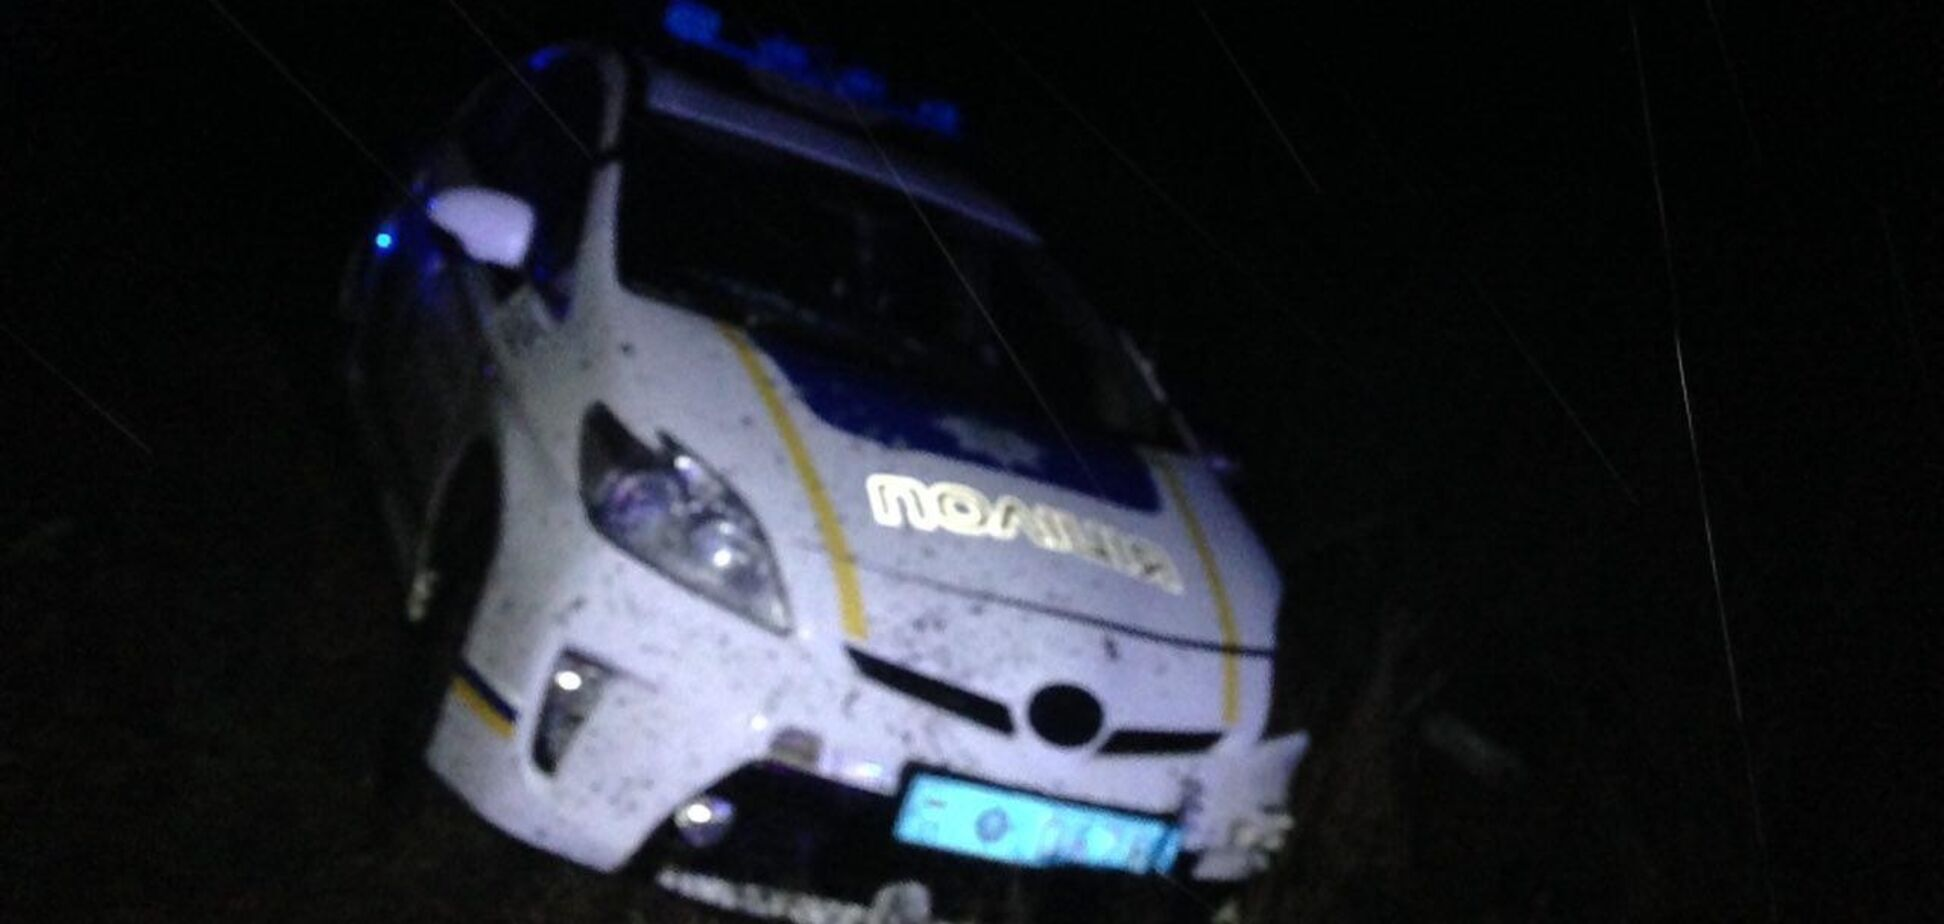 Под Николаевом полиция застрелила мужчину